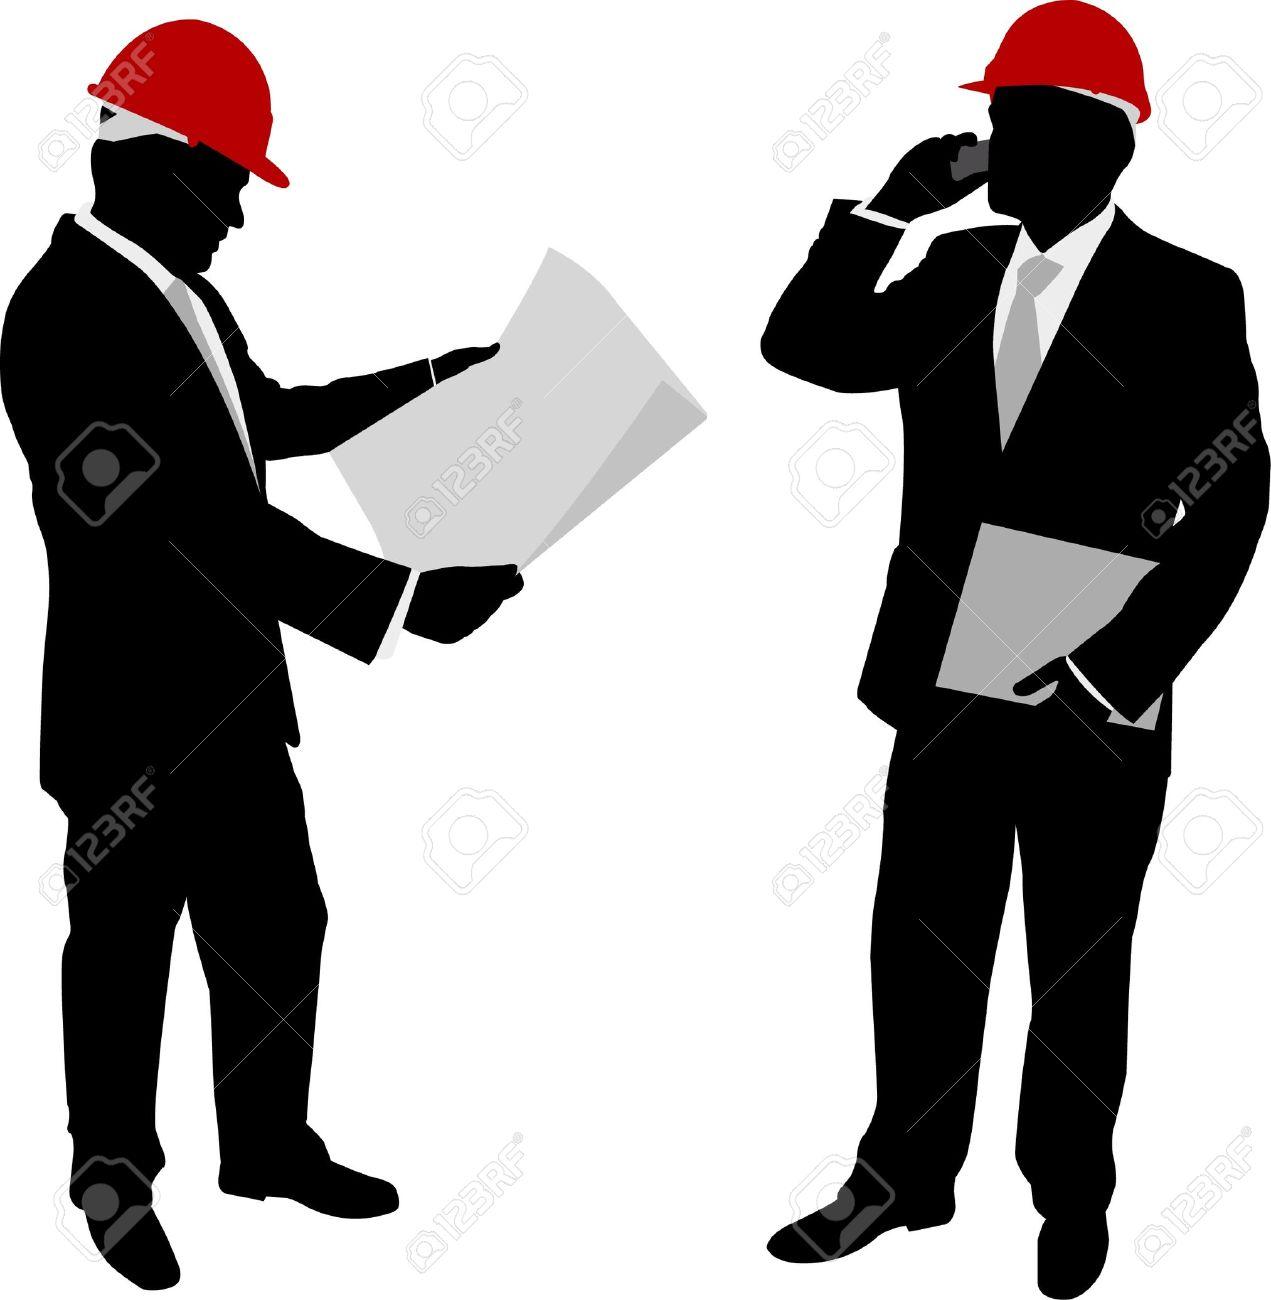 businessmen with hard hat - vector - 11663883